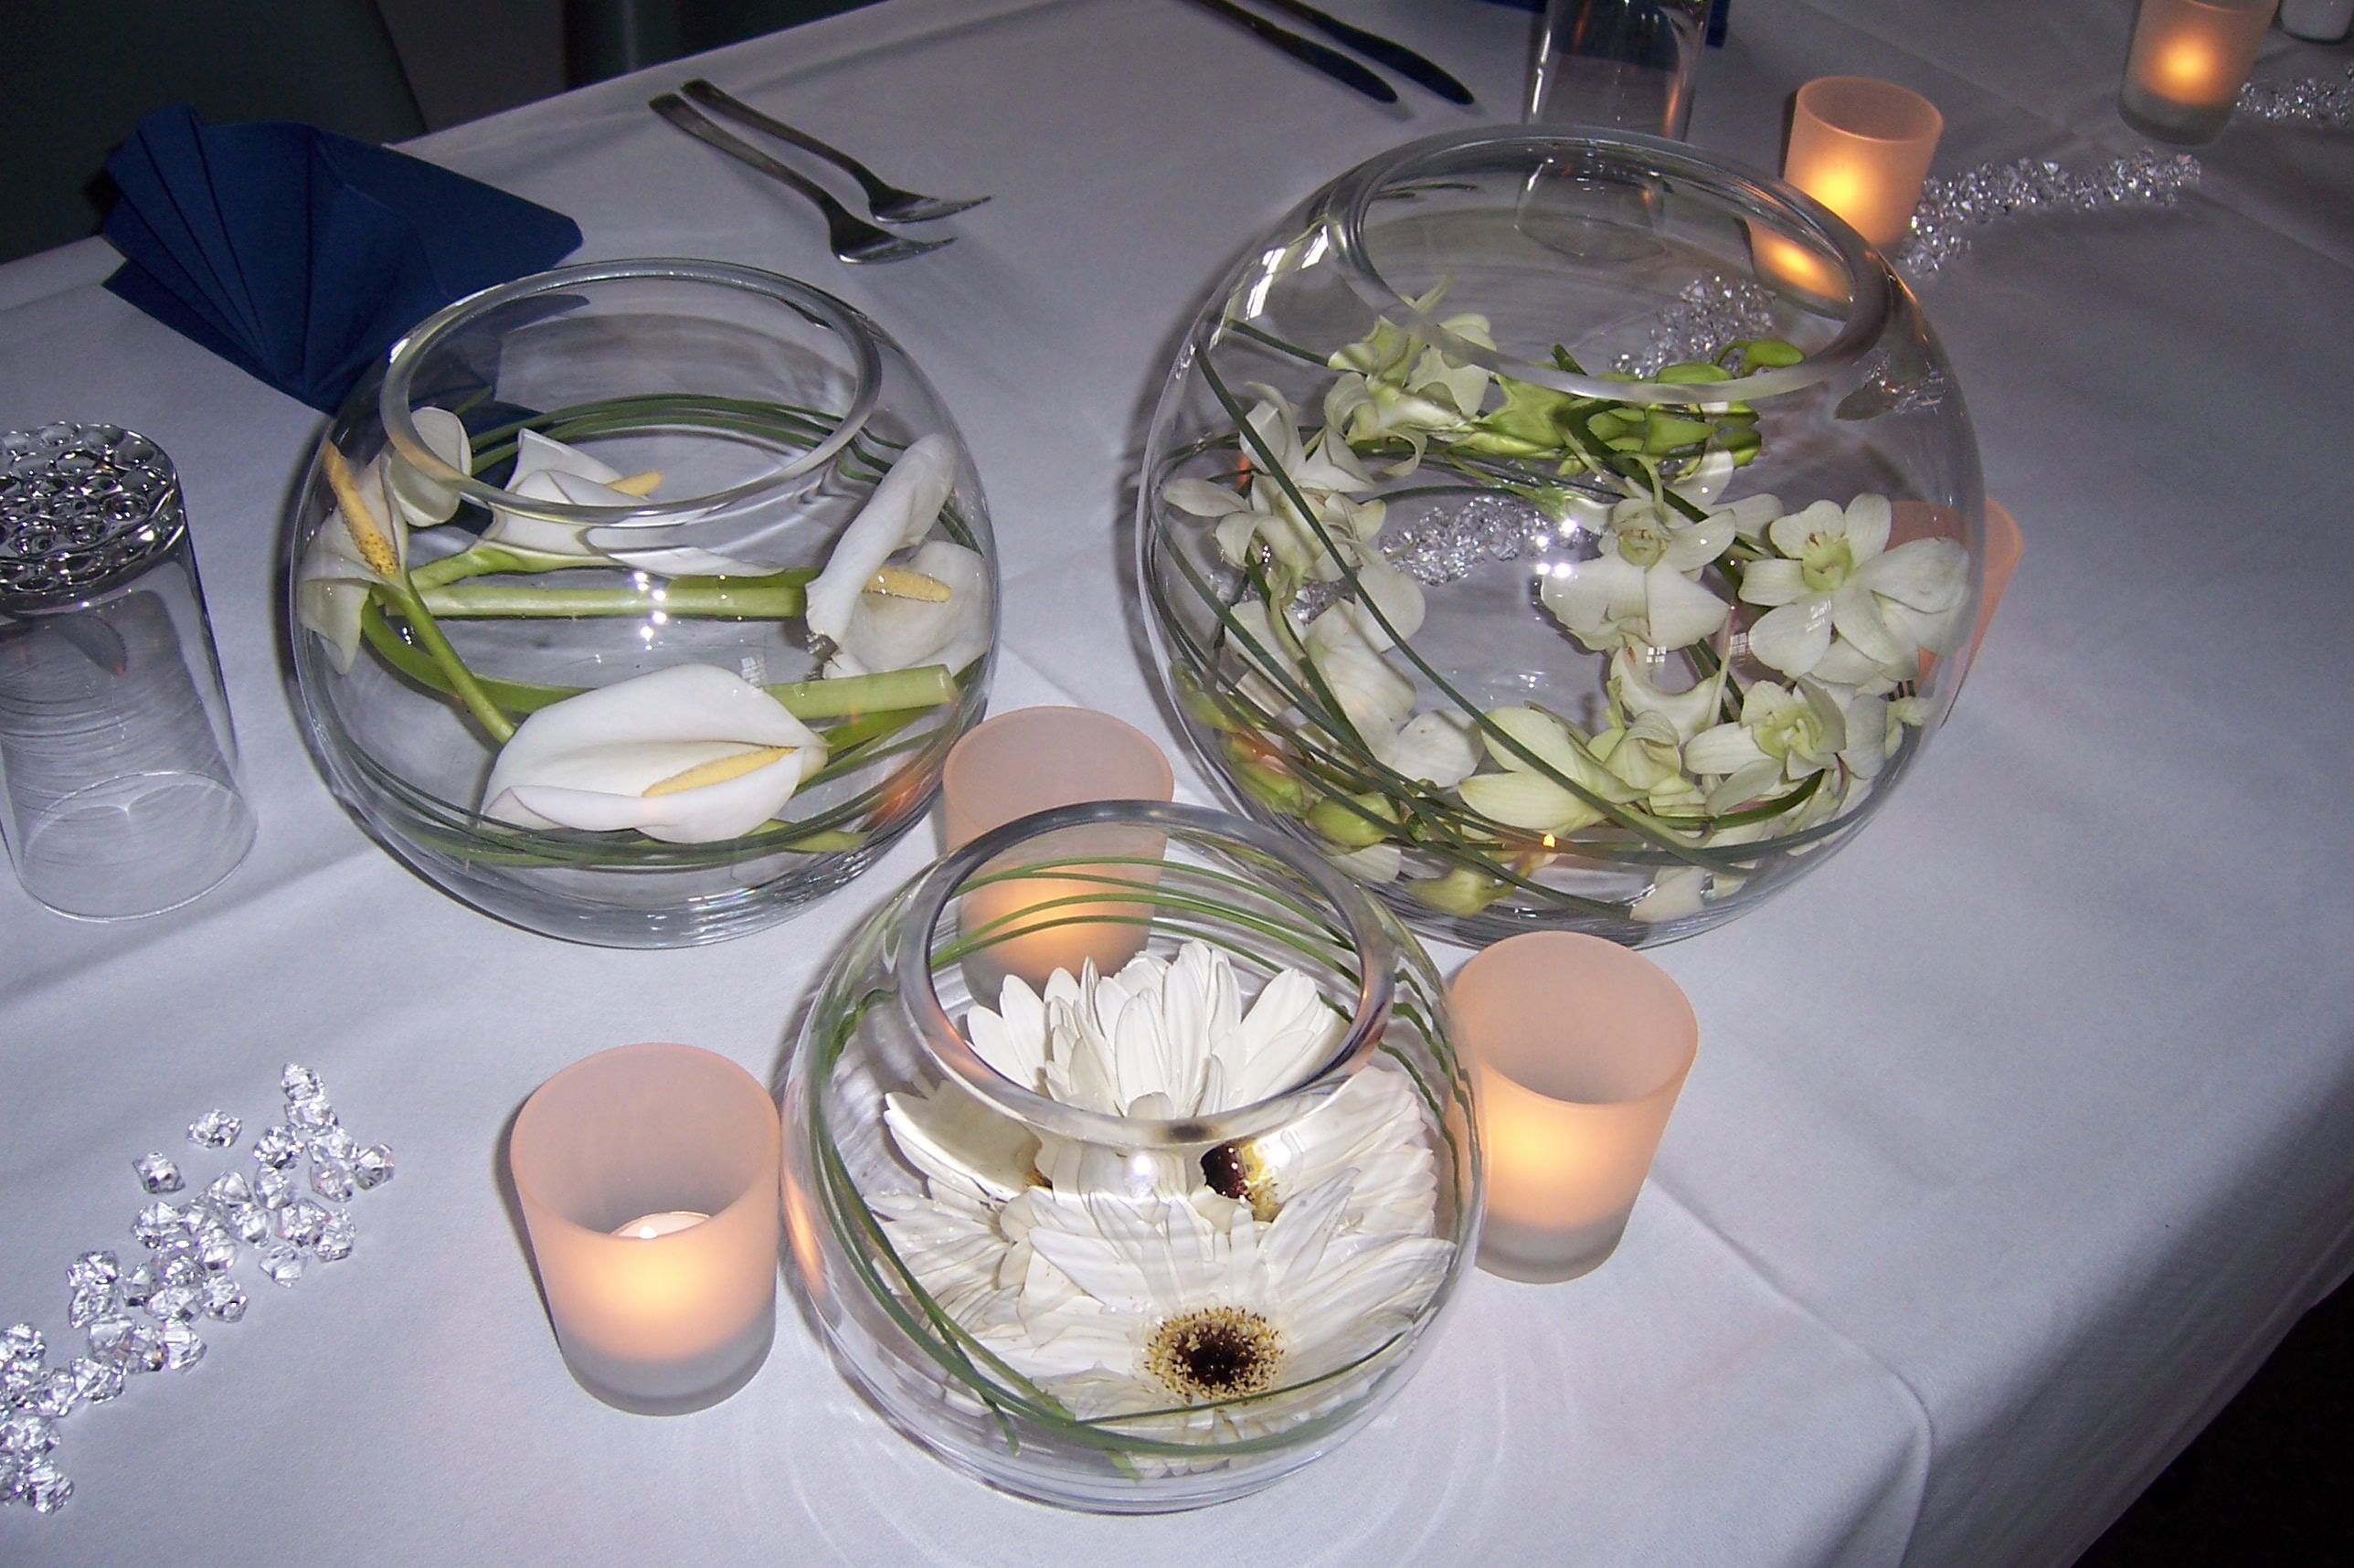 3. Wedding Table Decorations